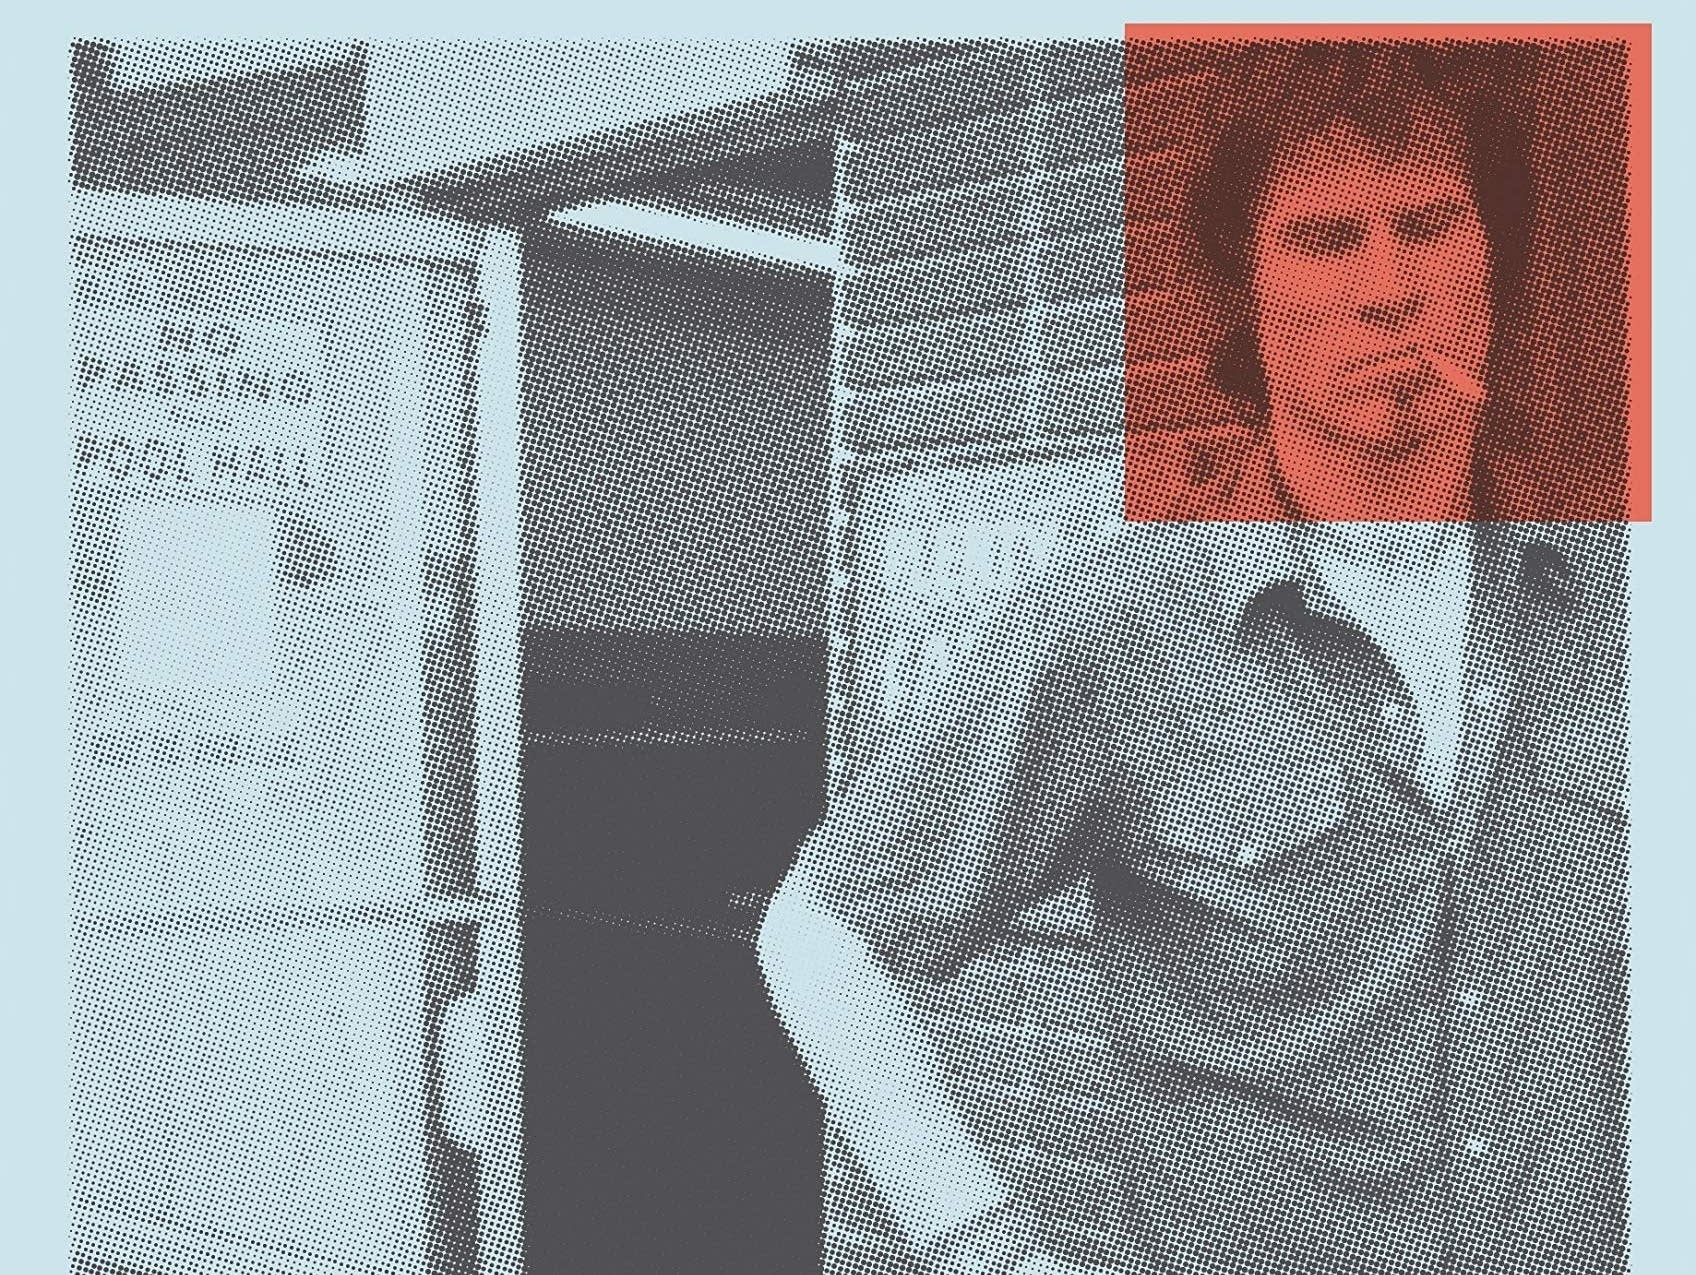 Mark Lanegan, 'Sing Backwards and Weep' book cover detail.